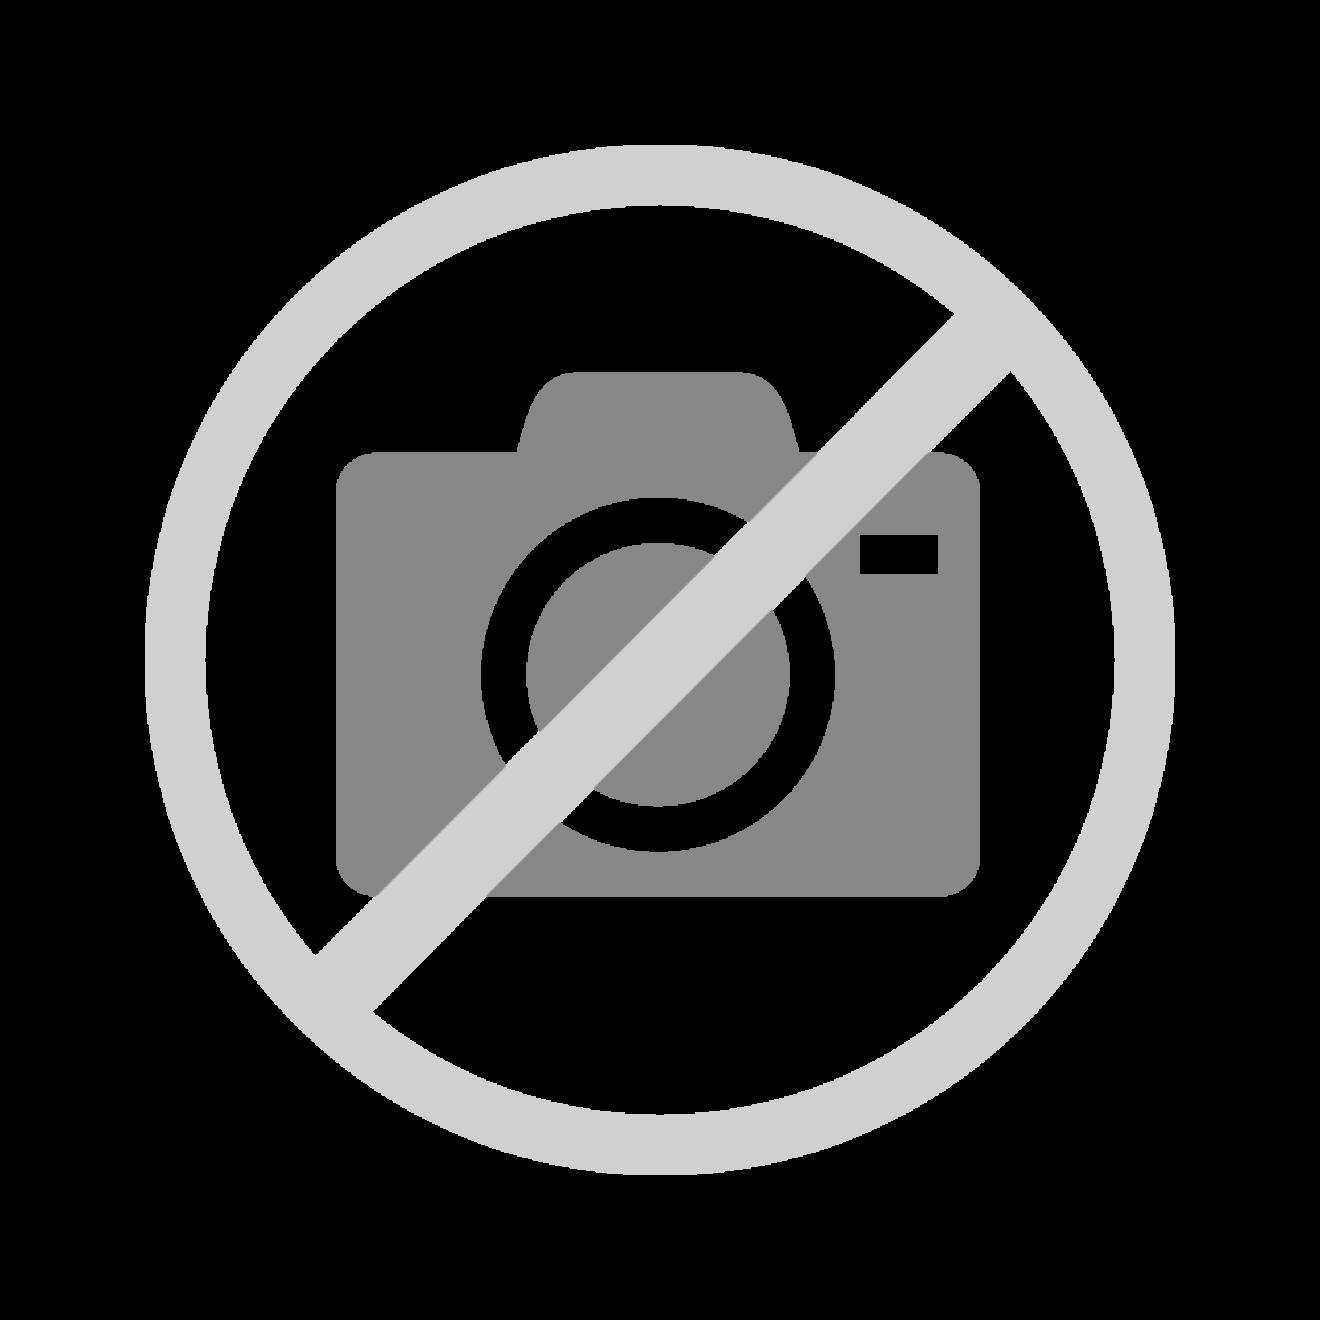 Sealskin douchegordijn 39 perle 39 kleur transparant materiaal peva sealskin bathroom fashion - Kleur modern toilet ...